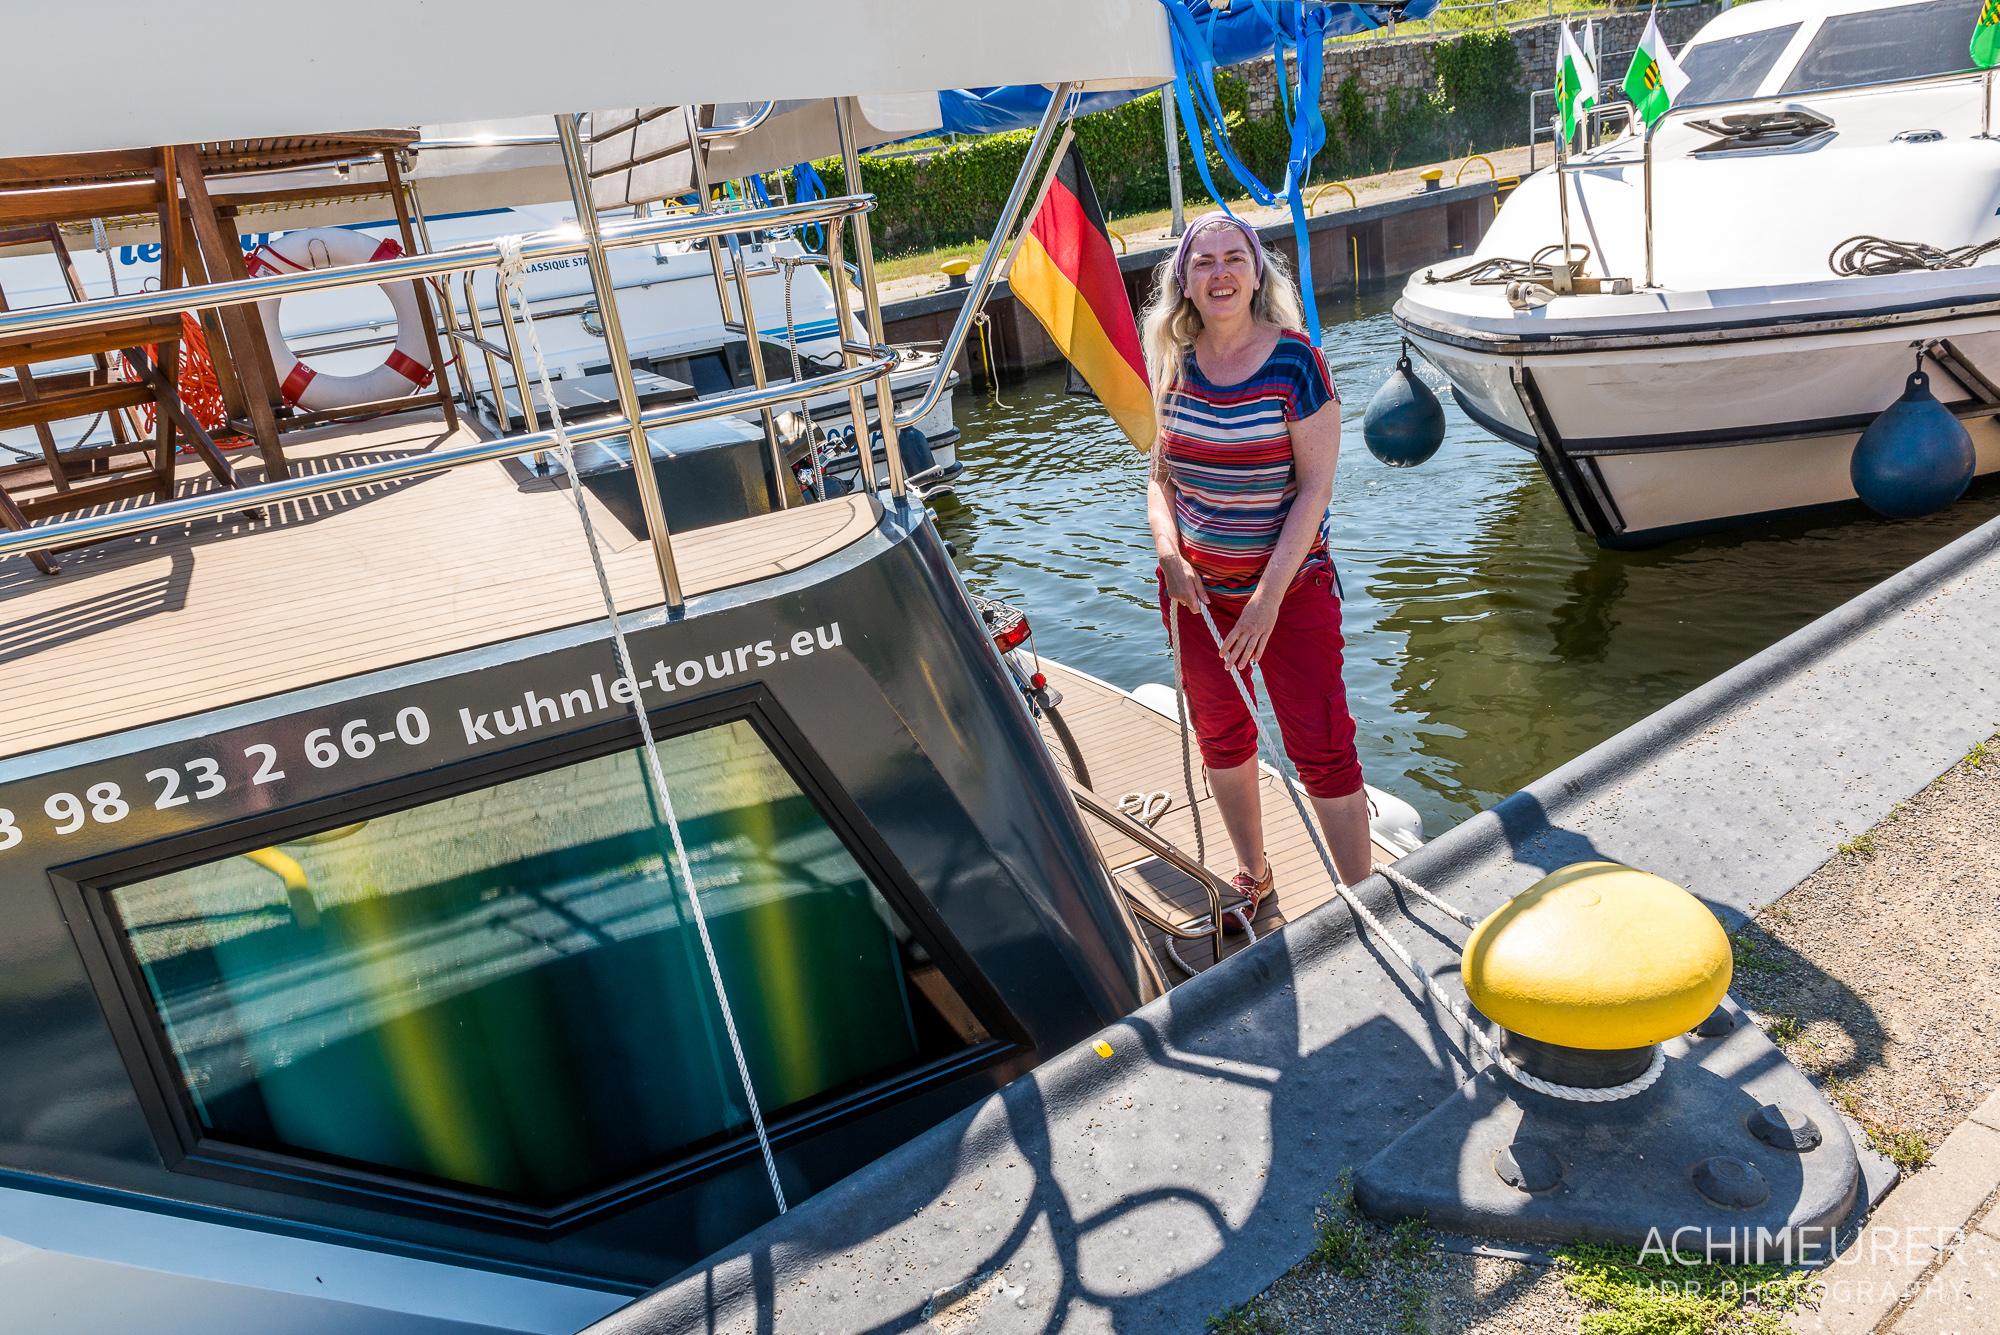 Hausboot-Kuhnle-Mueritz-Mecklenburg-Vorpommern-See_3193